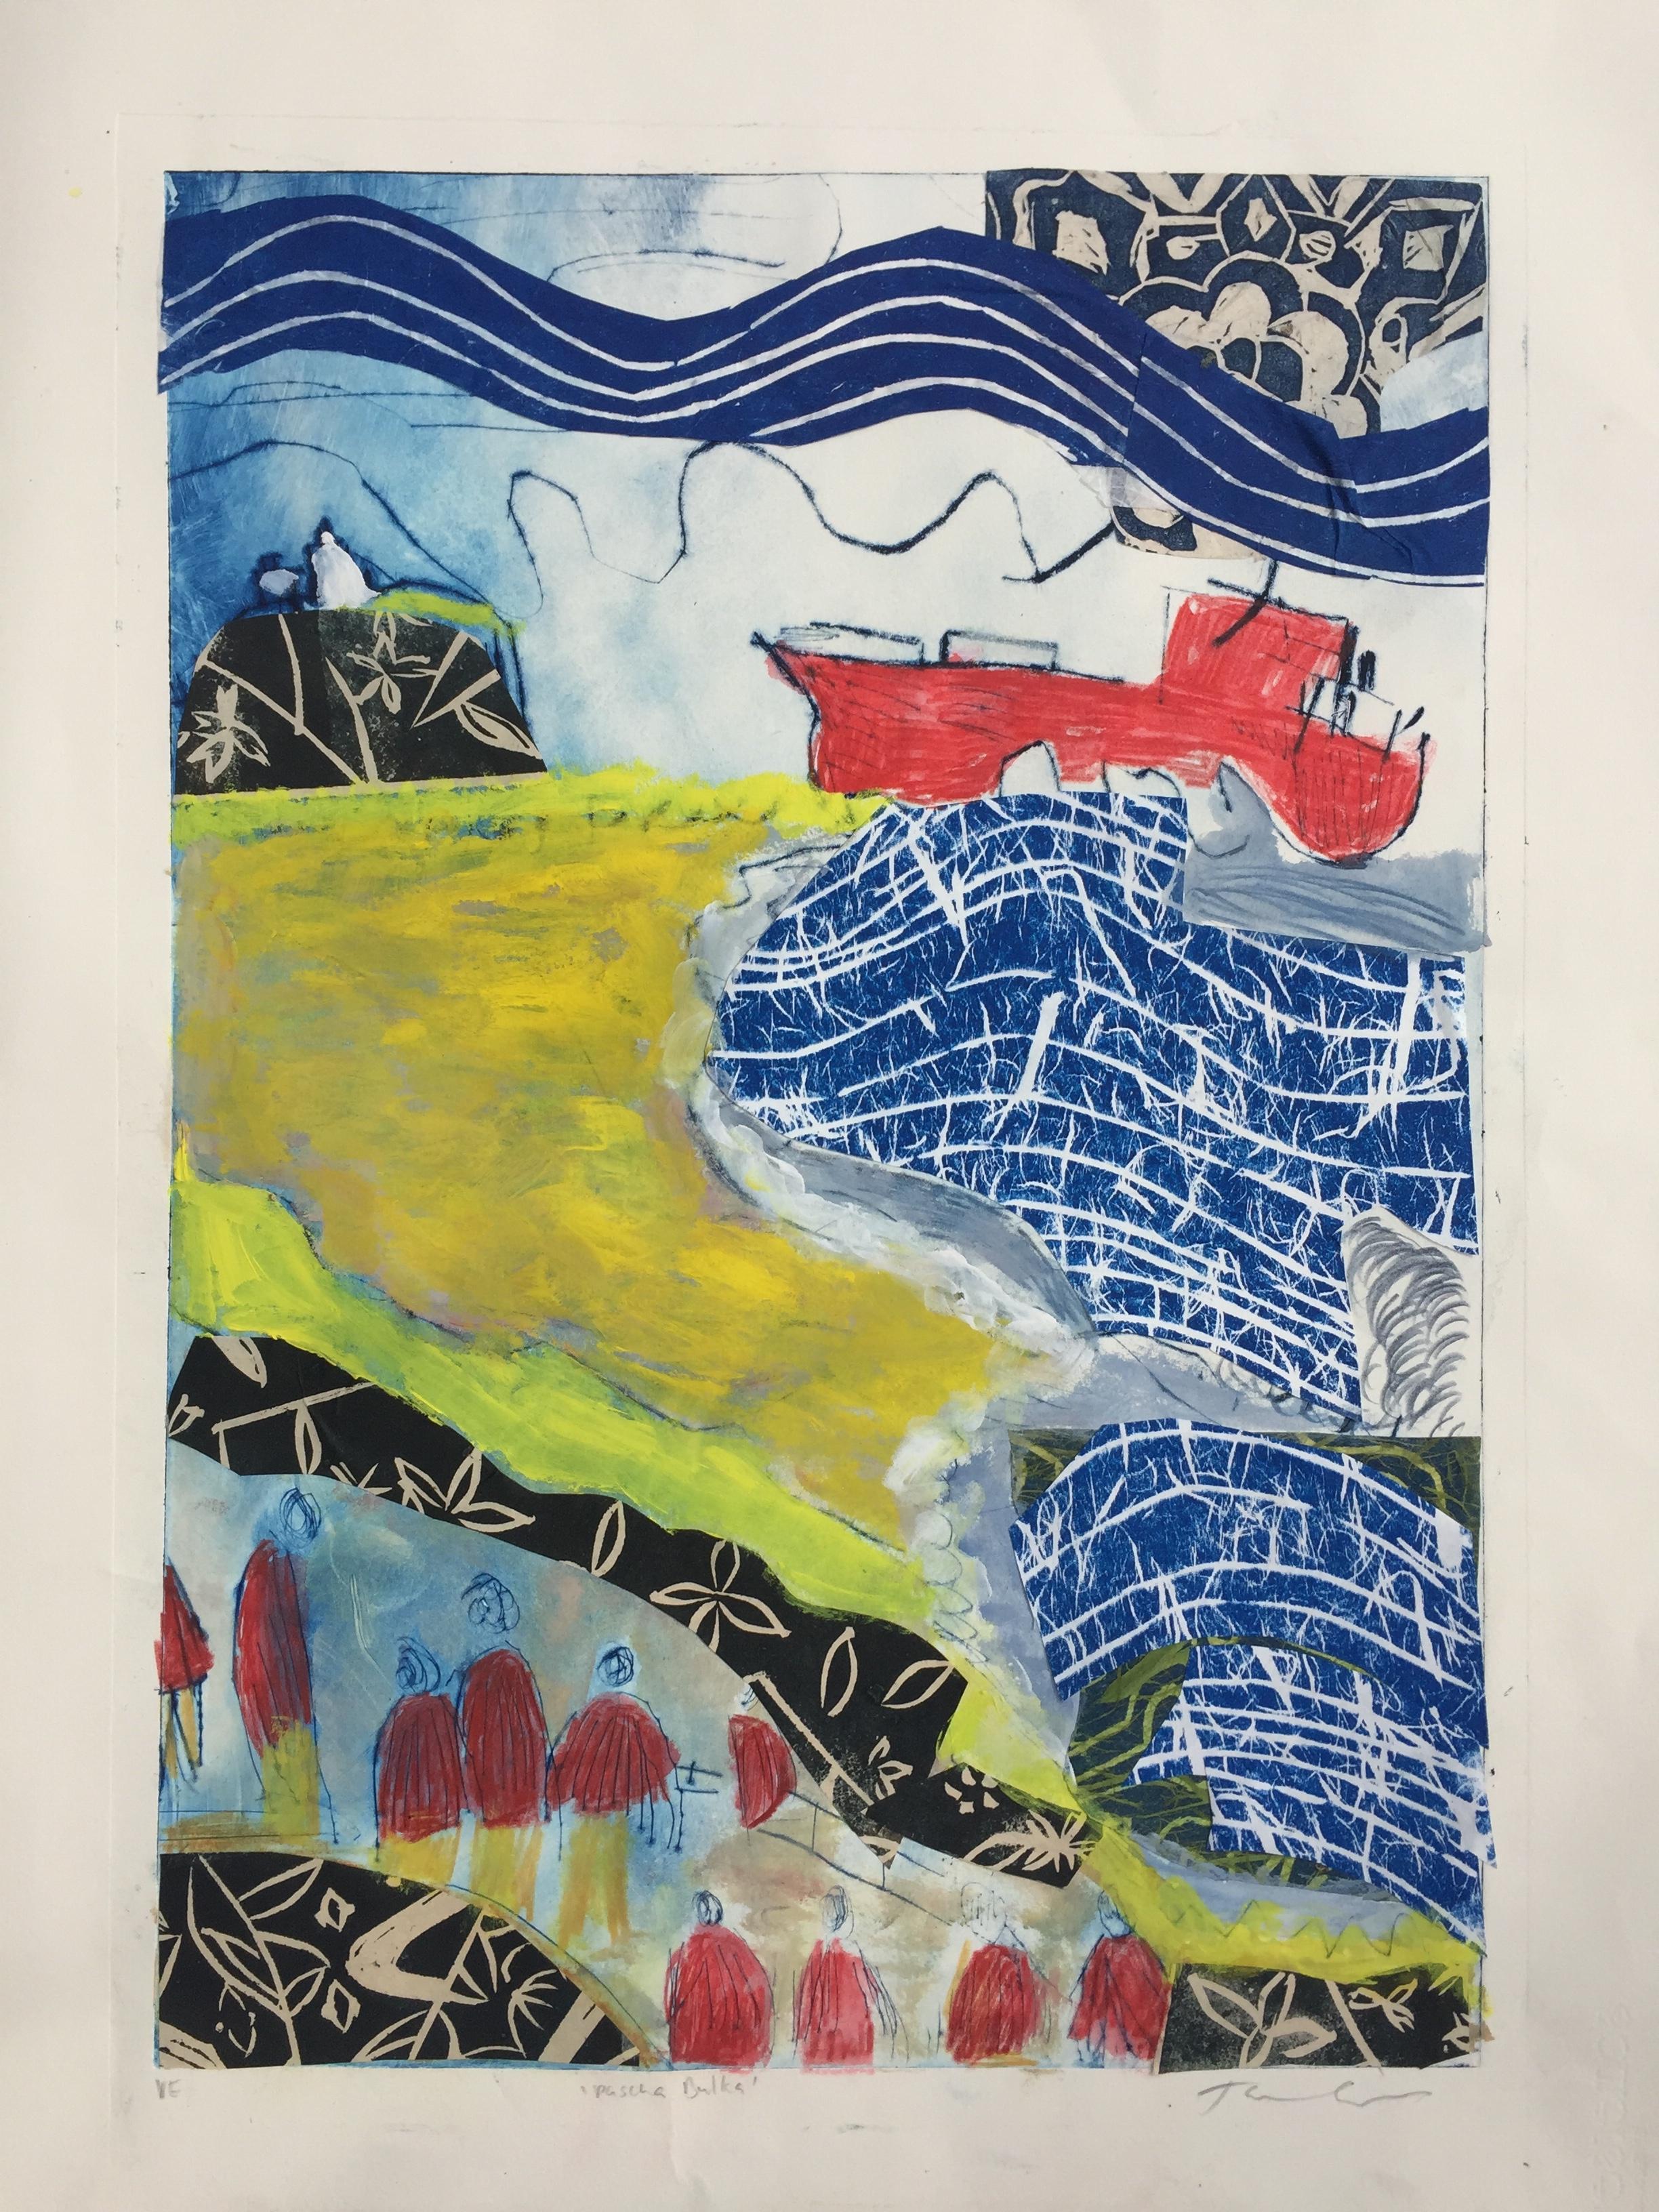 Jane Collins_Pasha Bulka_2018_printmaking, collage and paint_76 x 56cm_$650.00.jpg